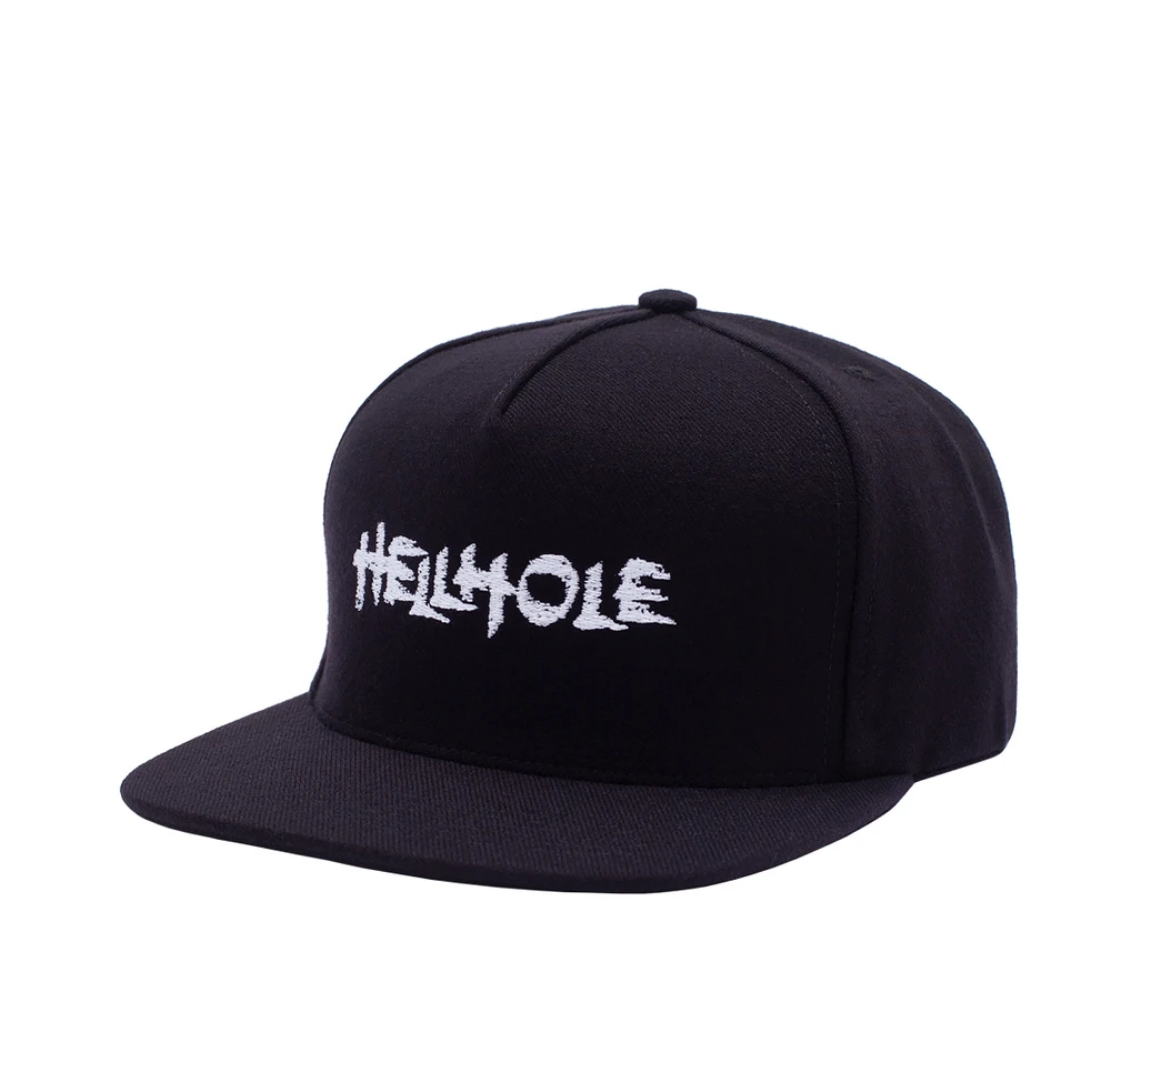 Hockey Hellhole Hat Black